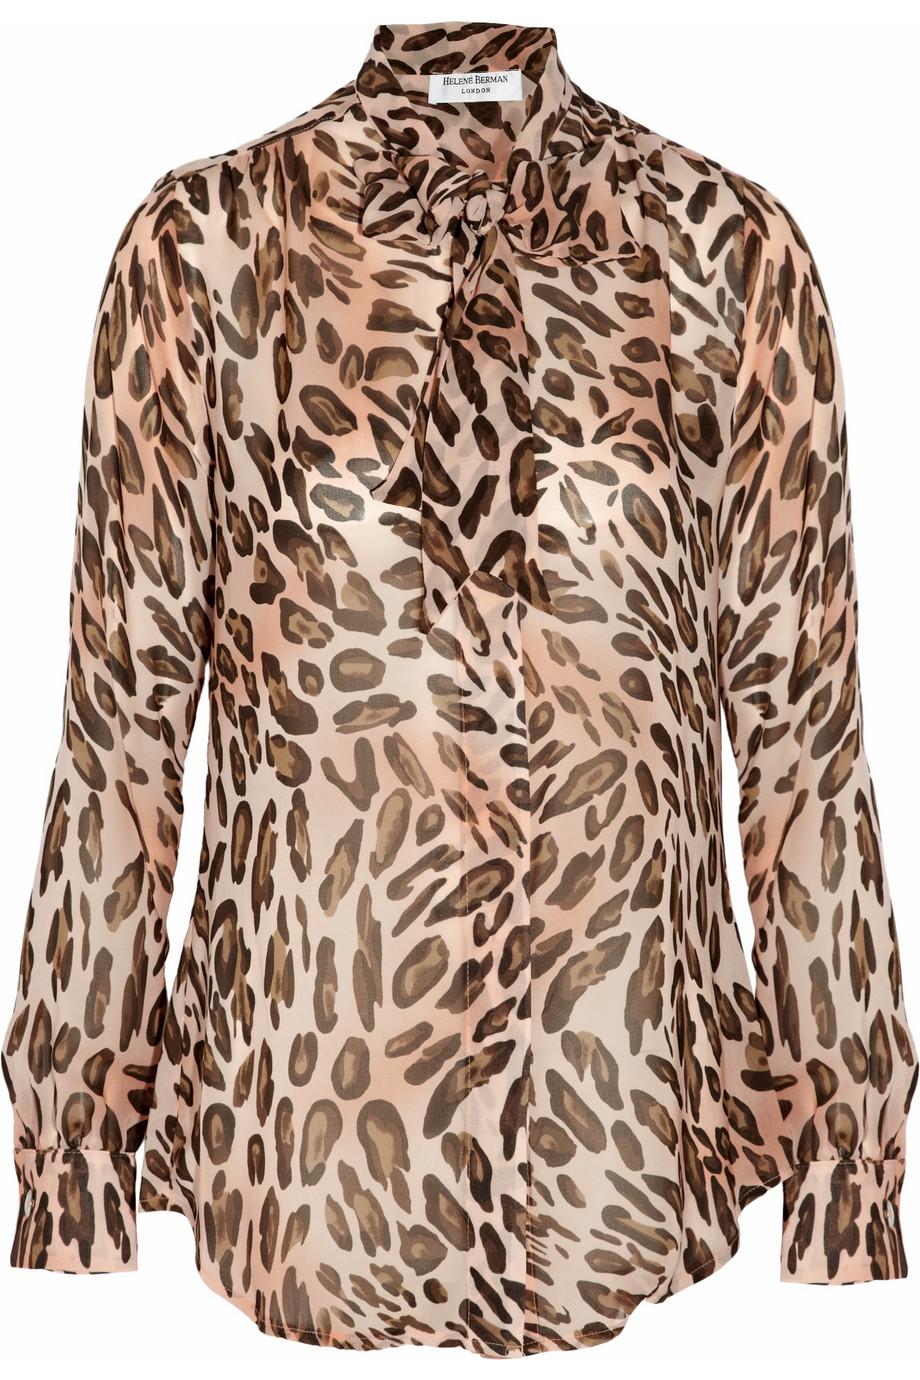 af9c68bfb138 Lyst - Helene Berman Leopard-print Chiffon Blouse